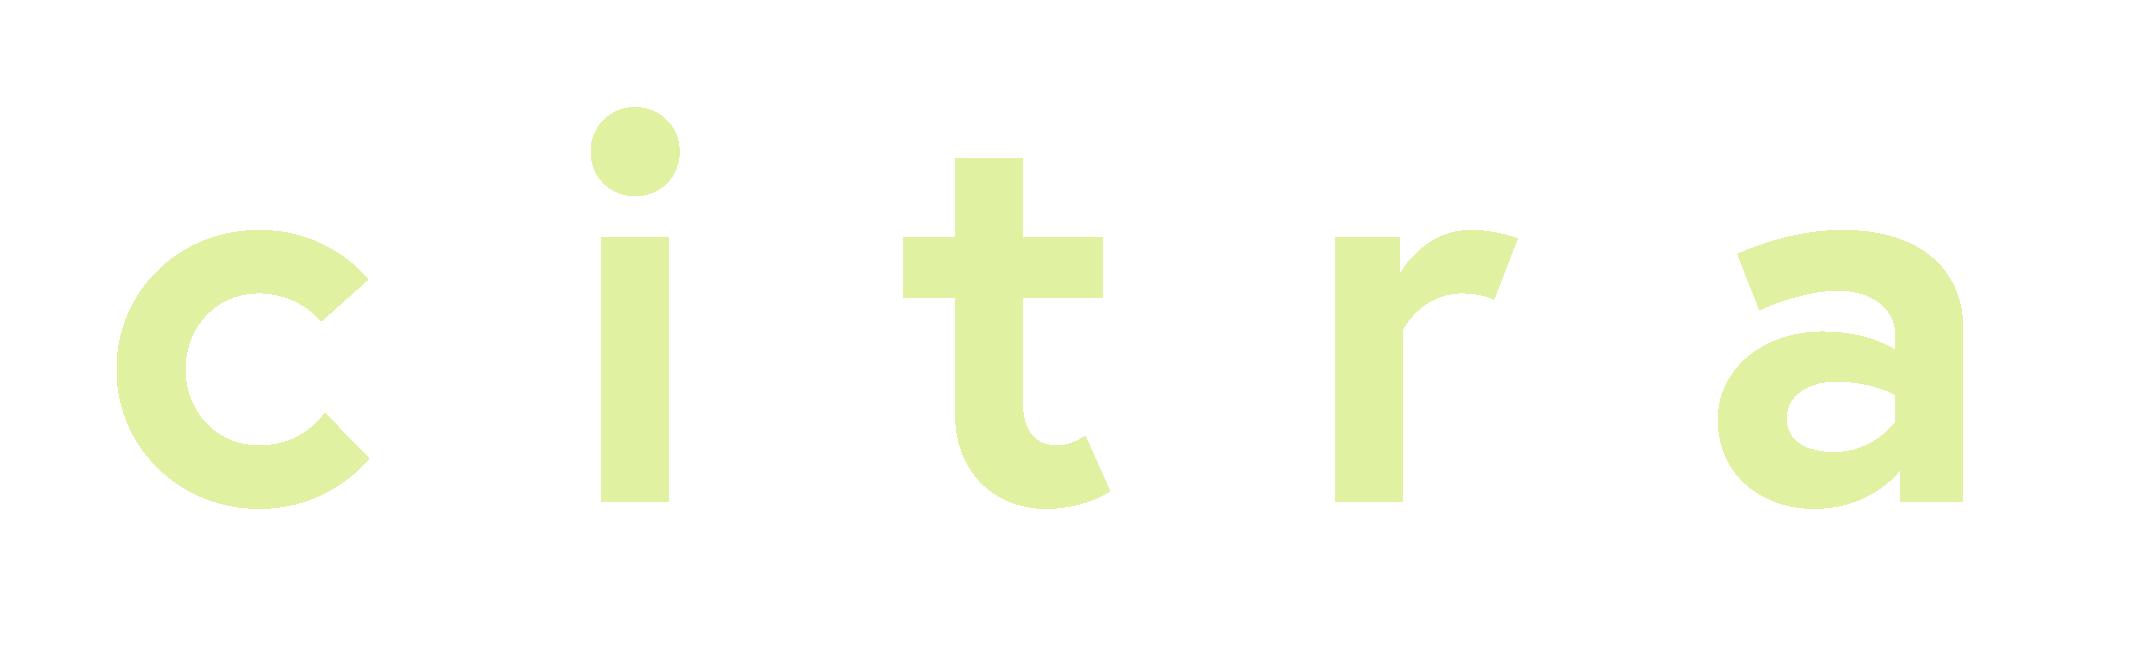 citra-12.png